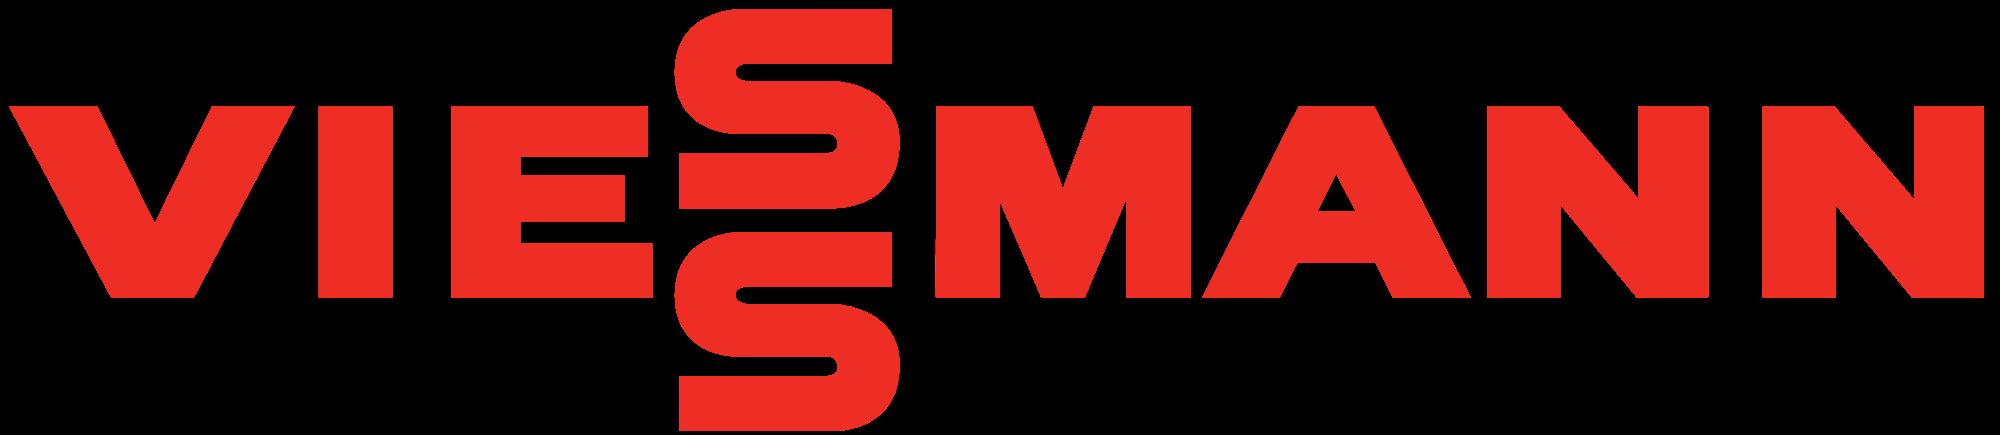 Logo de la marque Viessmann